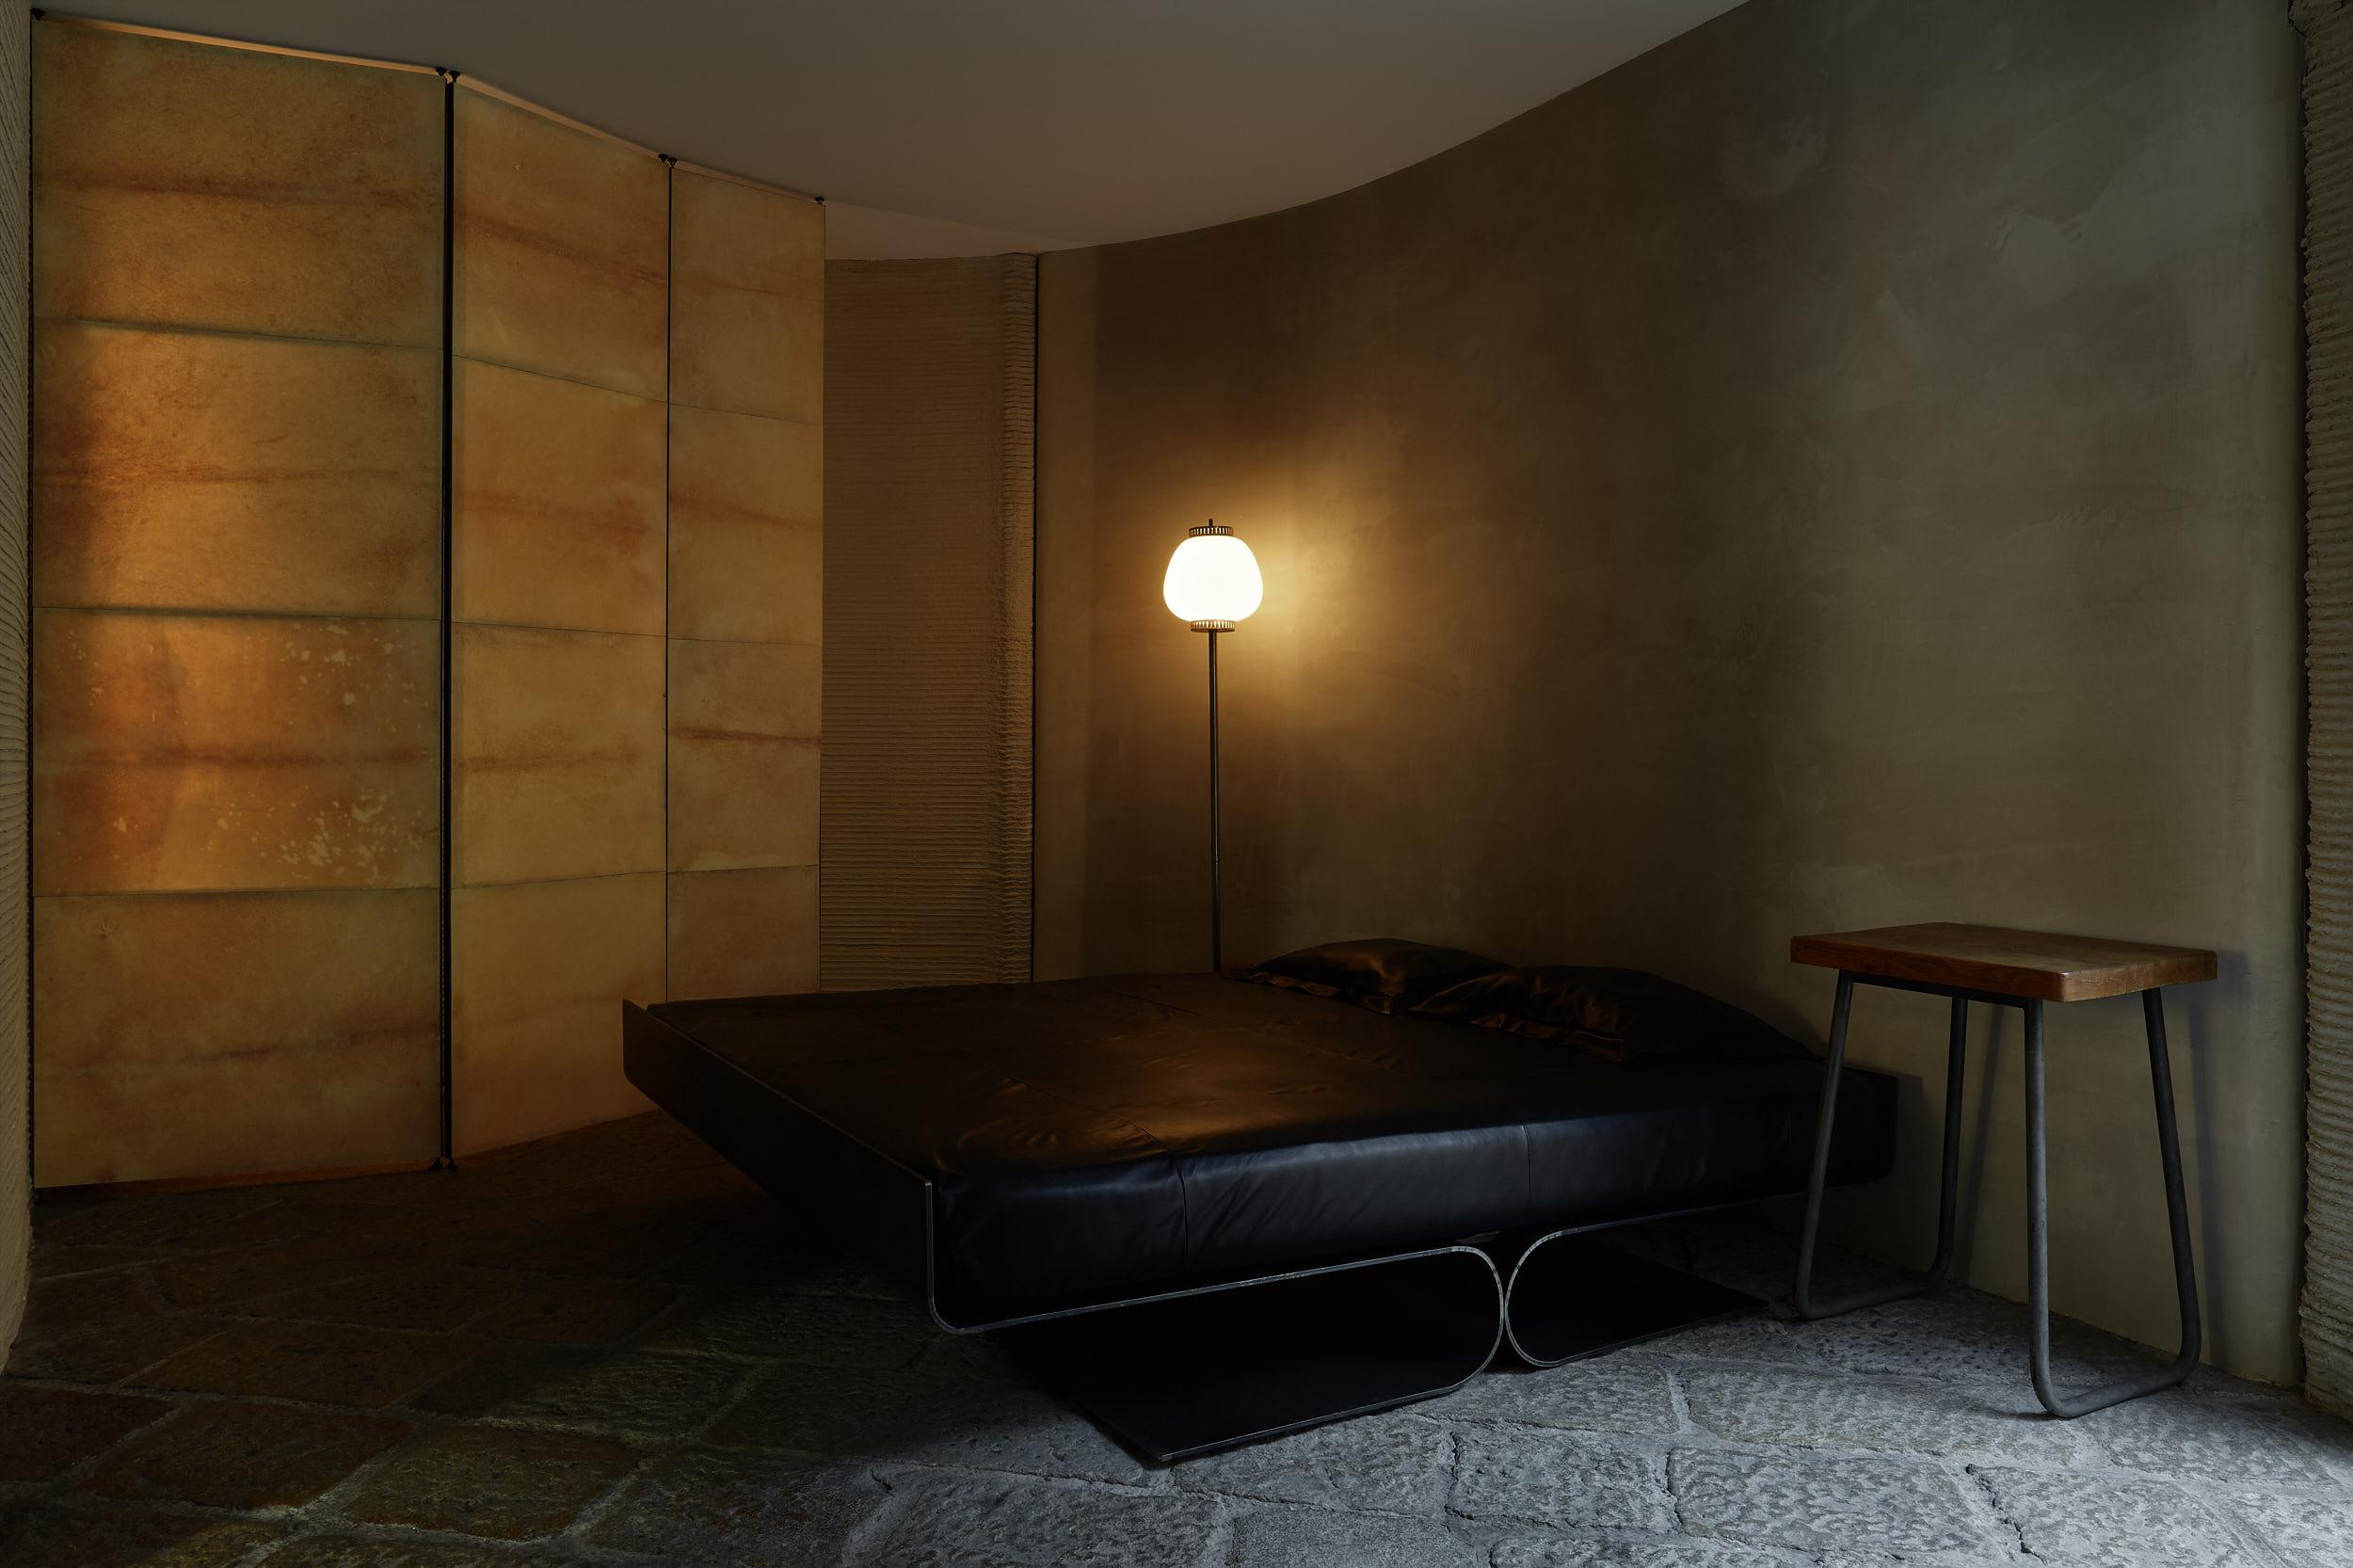 3D Housing 05 by CLS Architetti on Anniversary Magazine. Photo by Alex Lesage — threefold 4.jpg